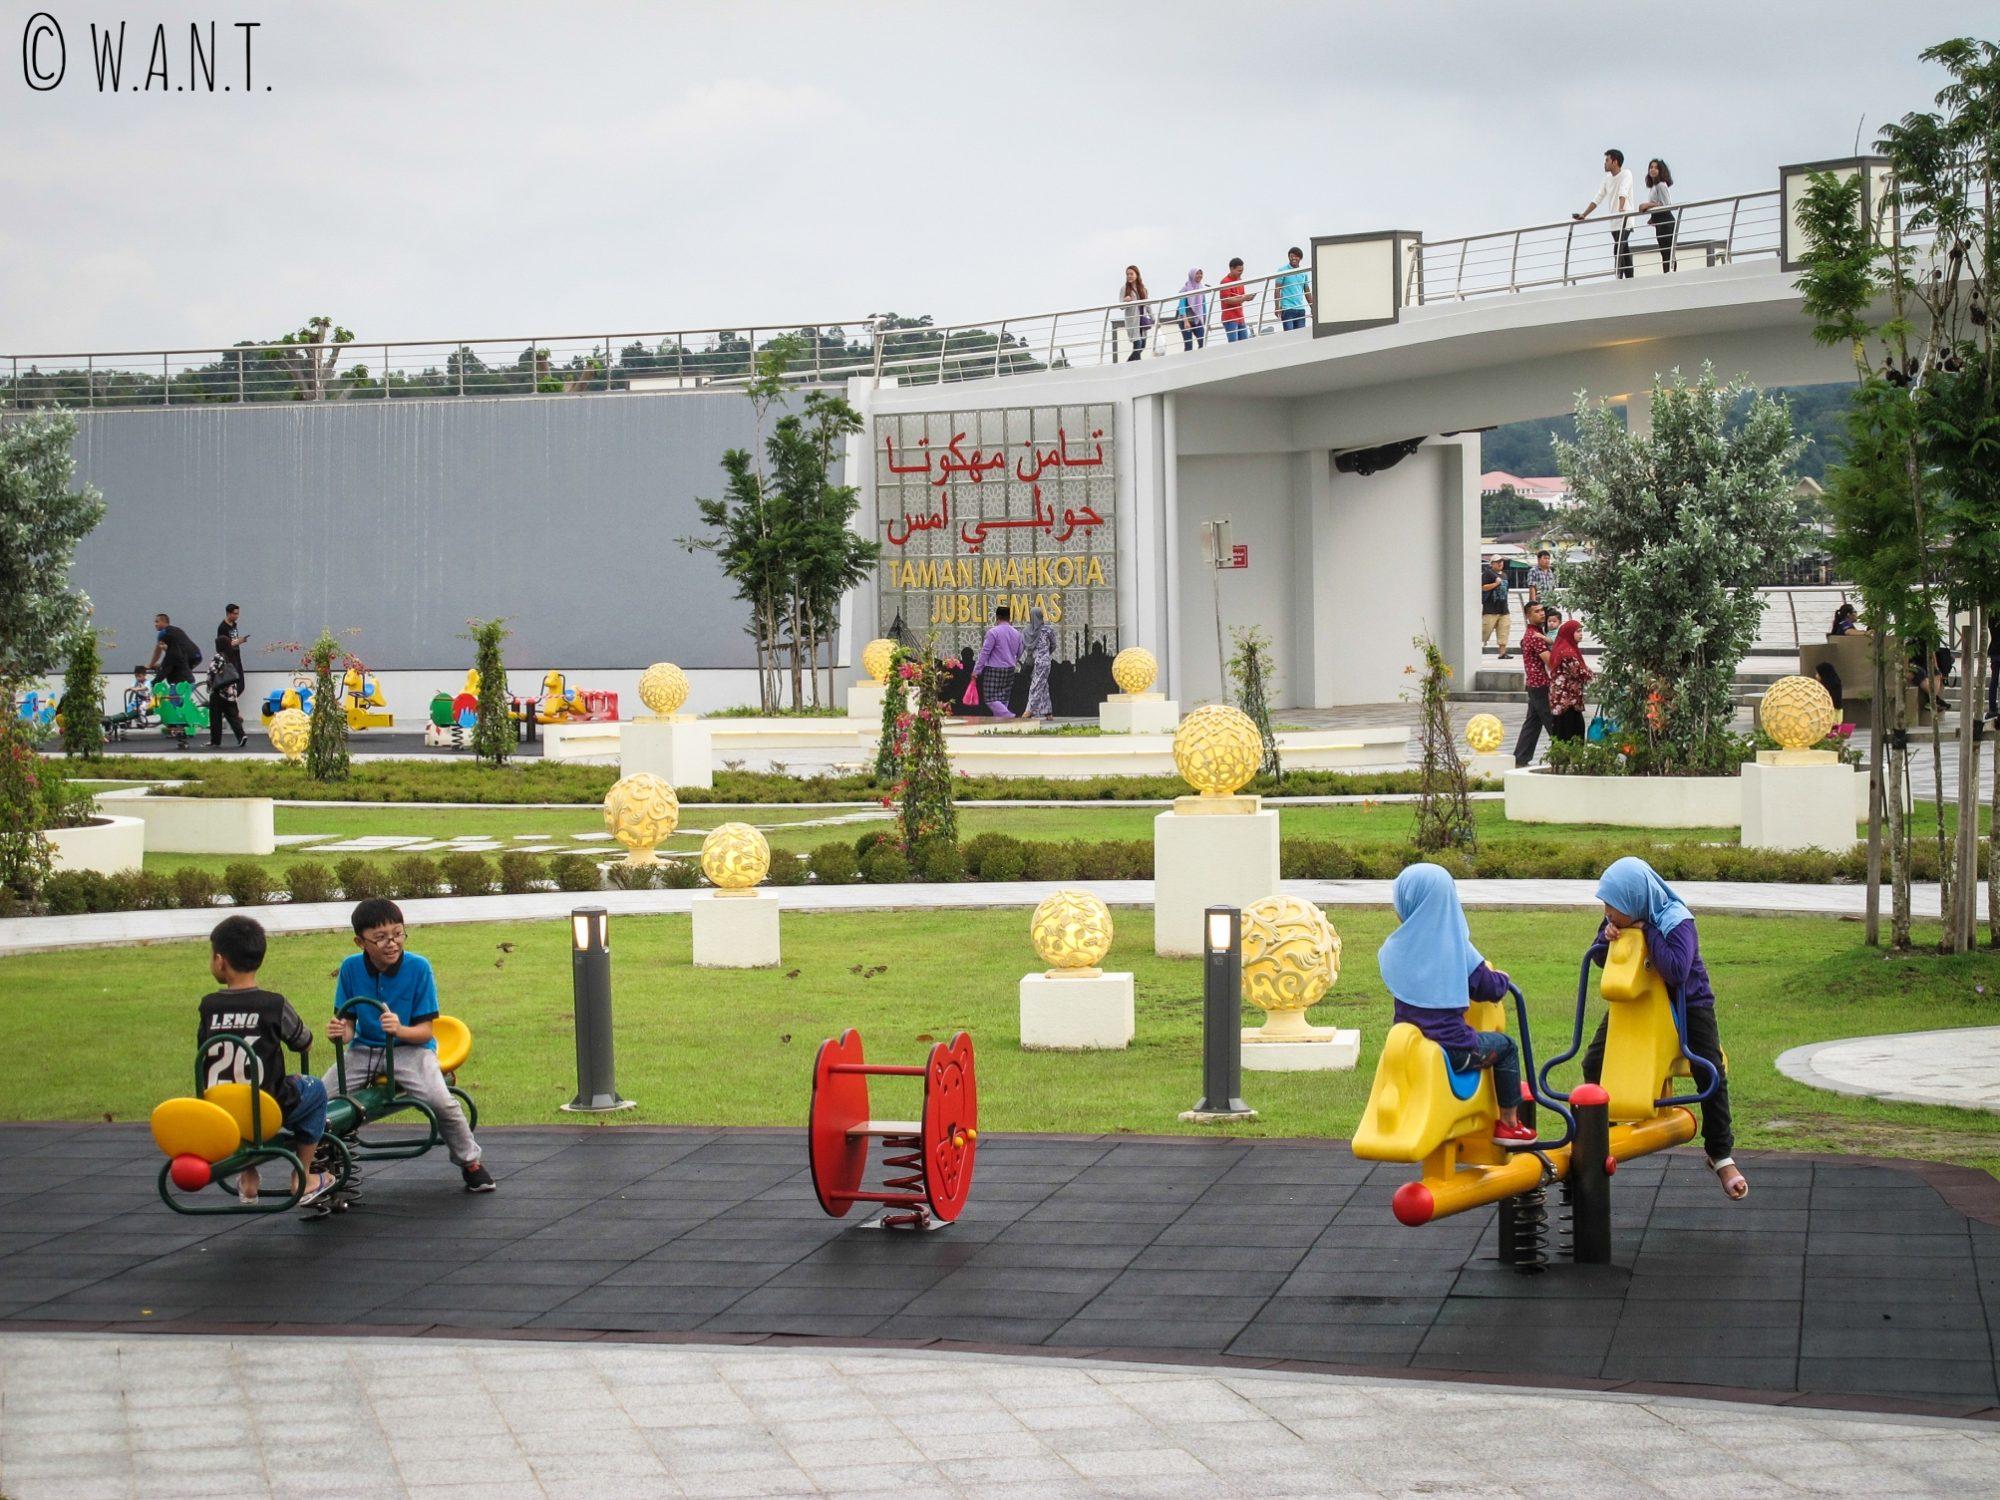 Aire de jeux animée du parc Taman Mahkota Jubli Emas de Bandar Seri Begawan